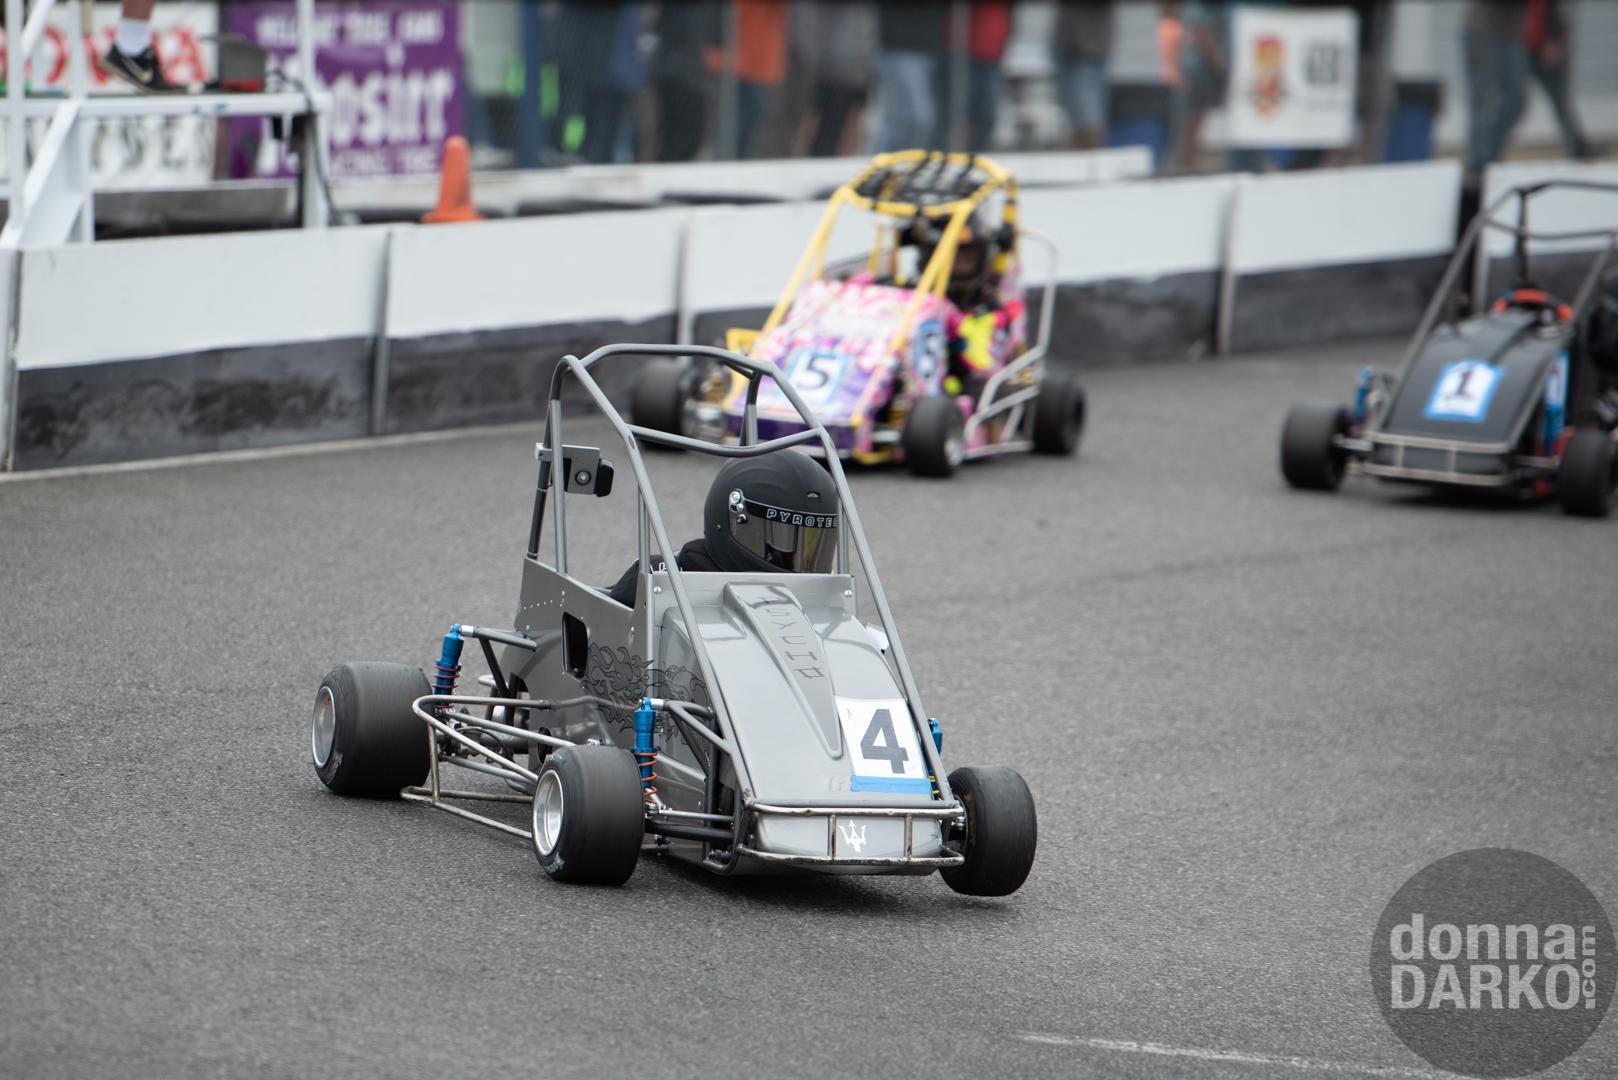 QWMA (Racing) 8-11-2019 DSC_5909.jpg